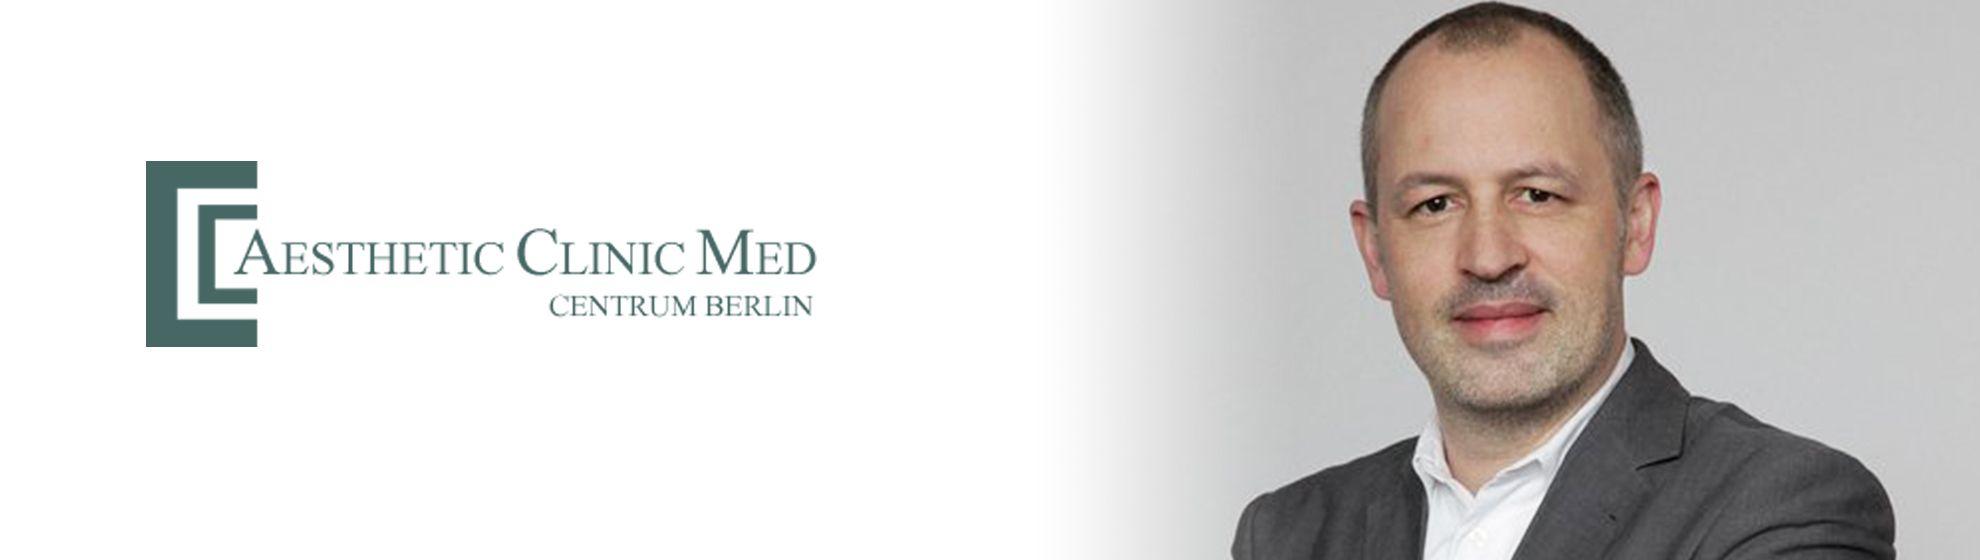 Dr. med. Henning Becker